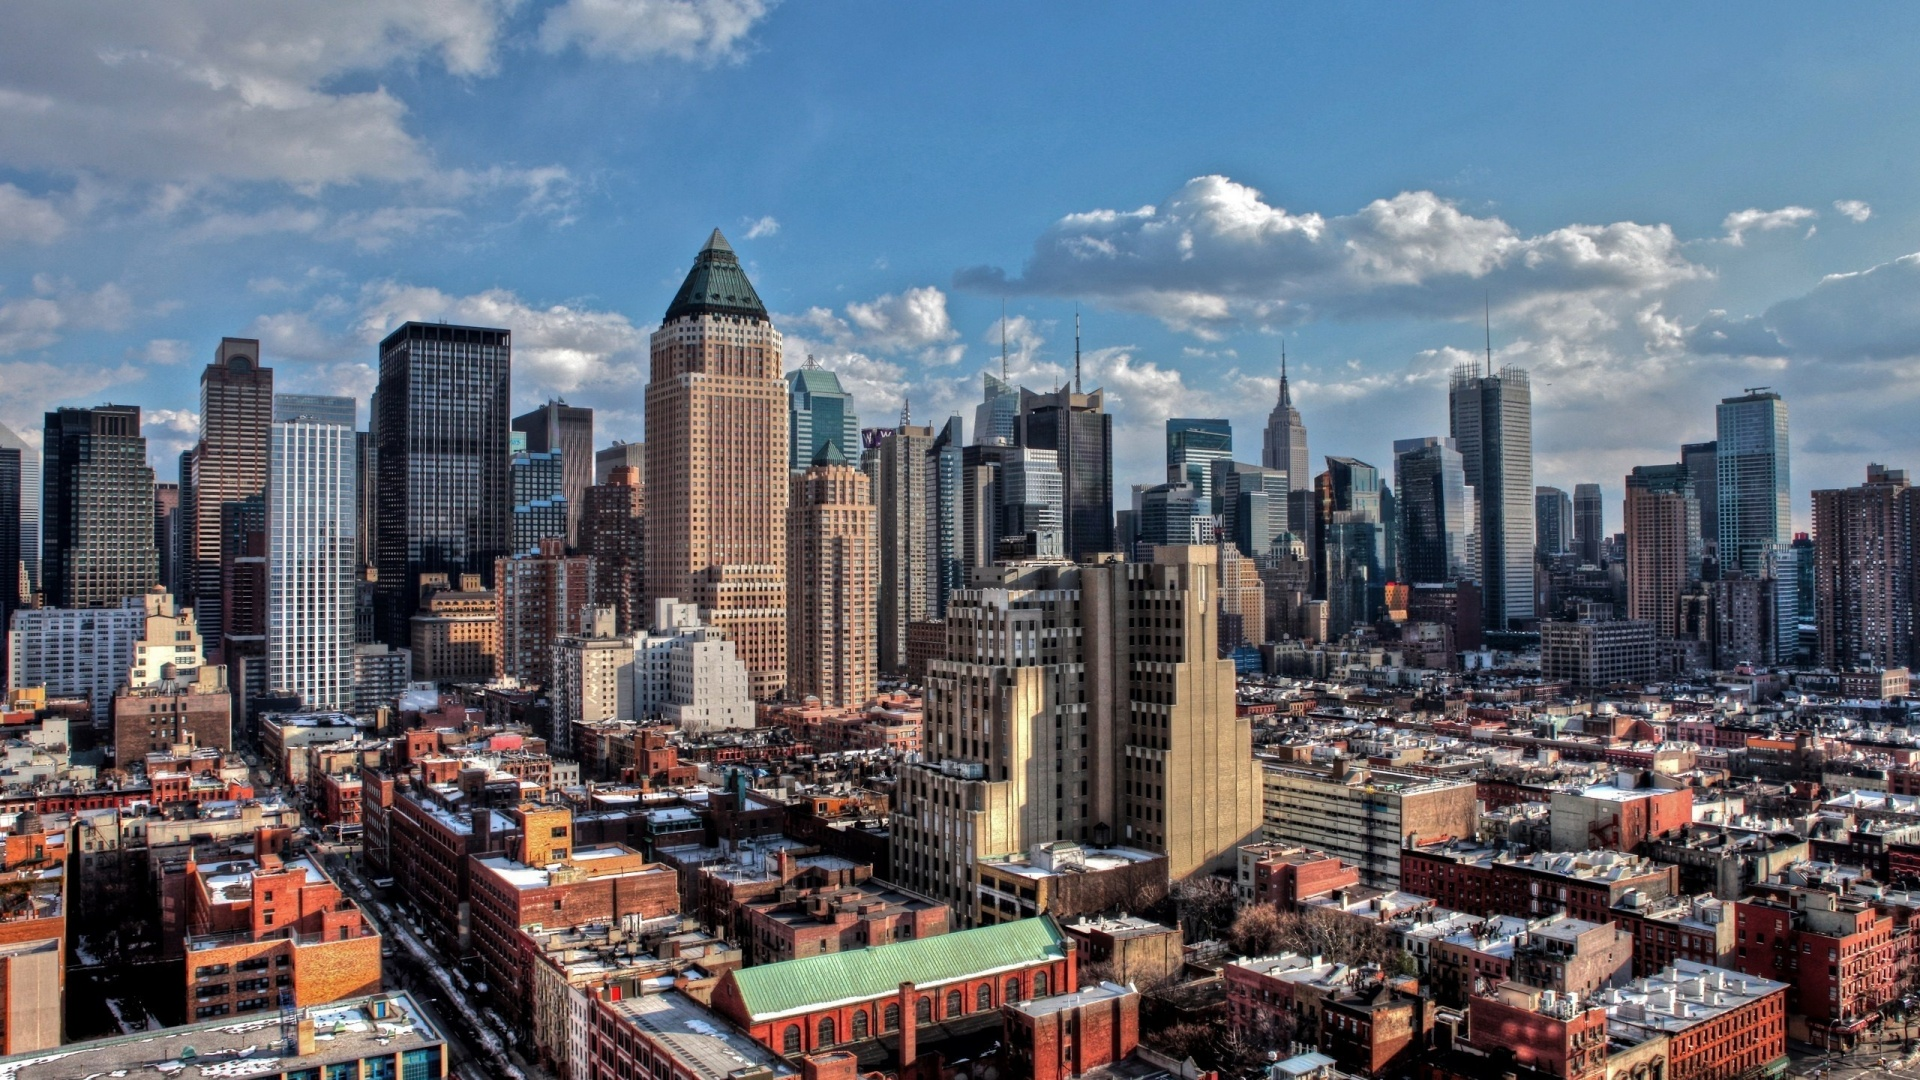 z40 new york sfondo desktop hd wallpaper manhattan city 1920x1080 1920x1080